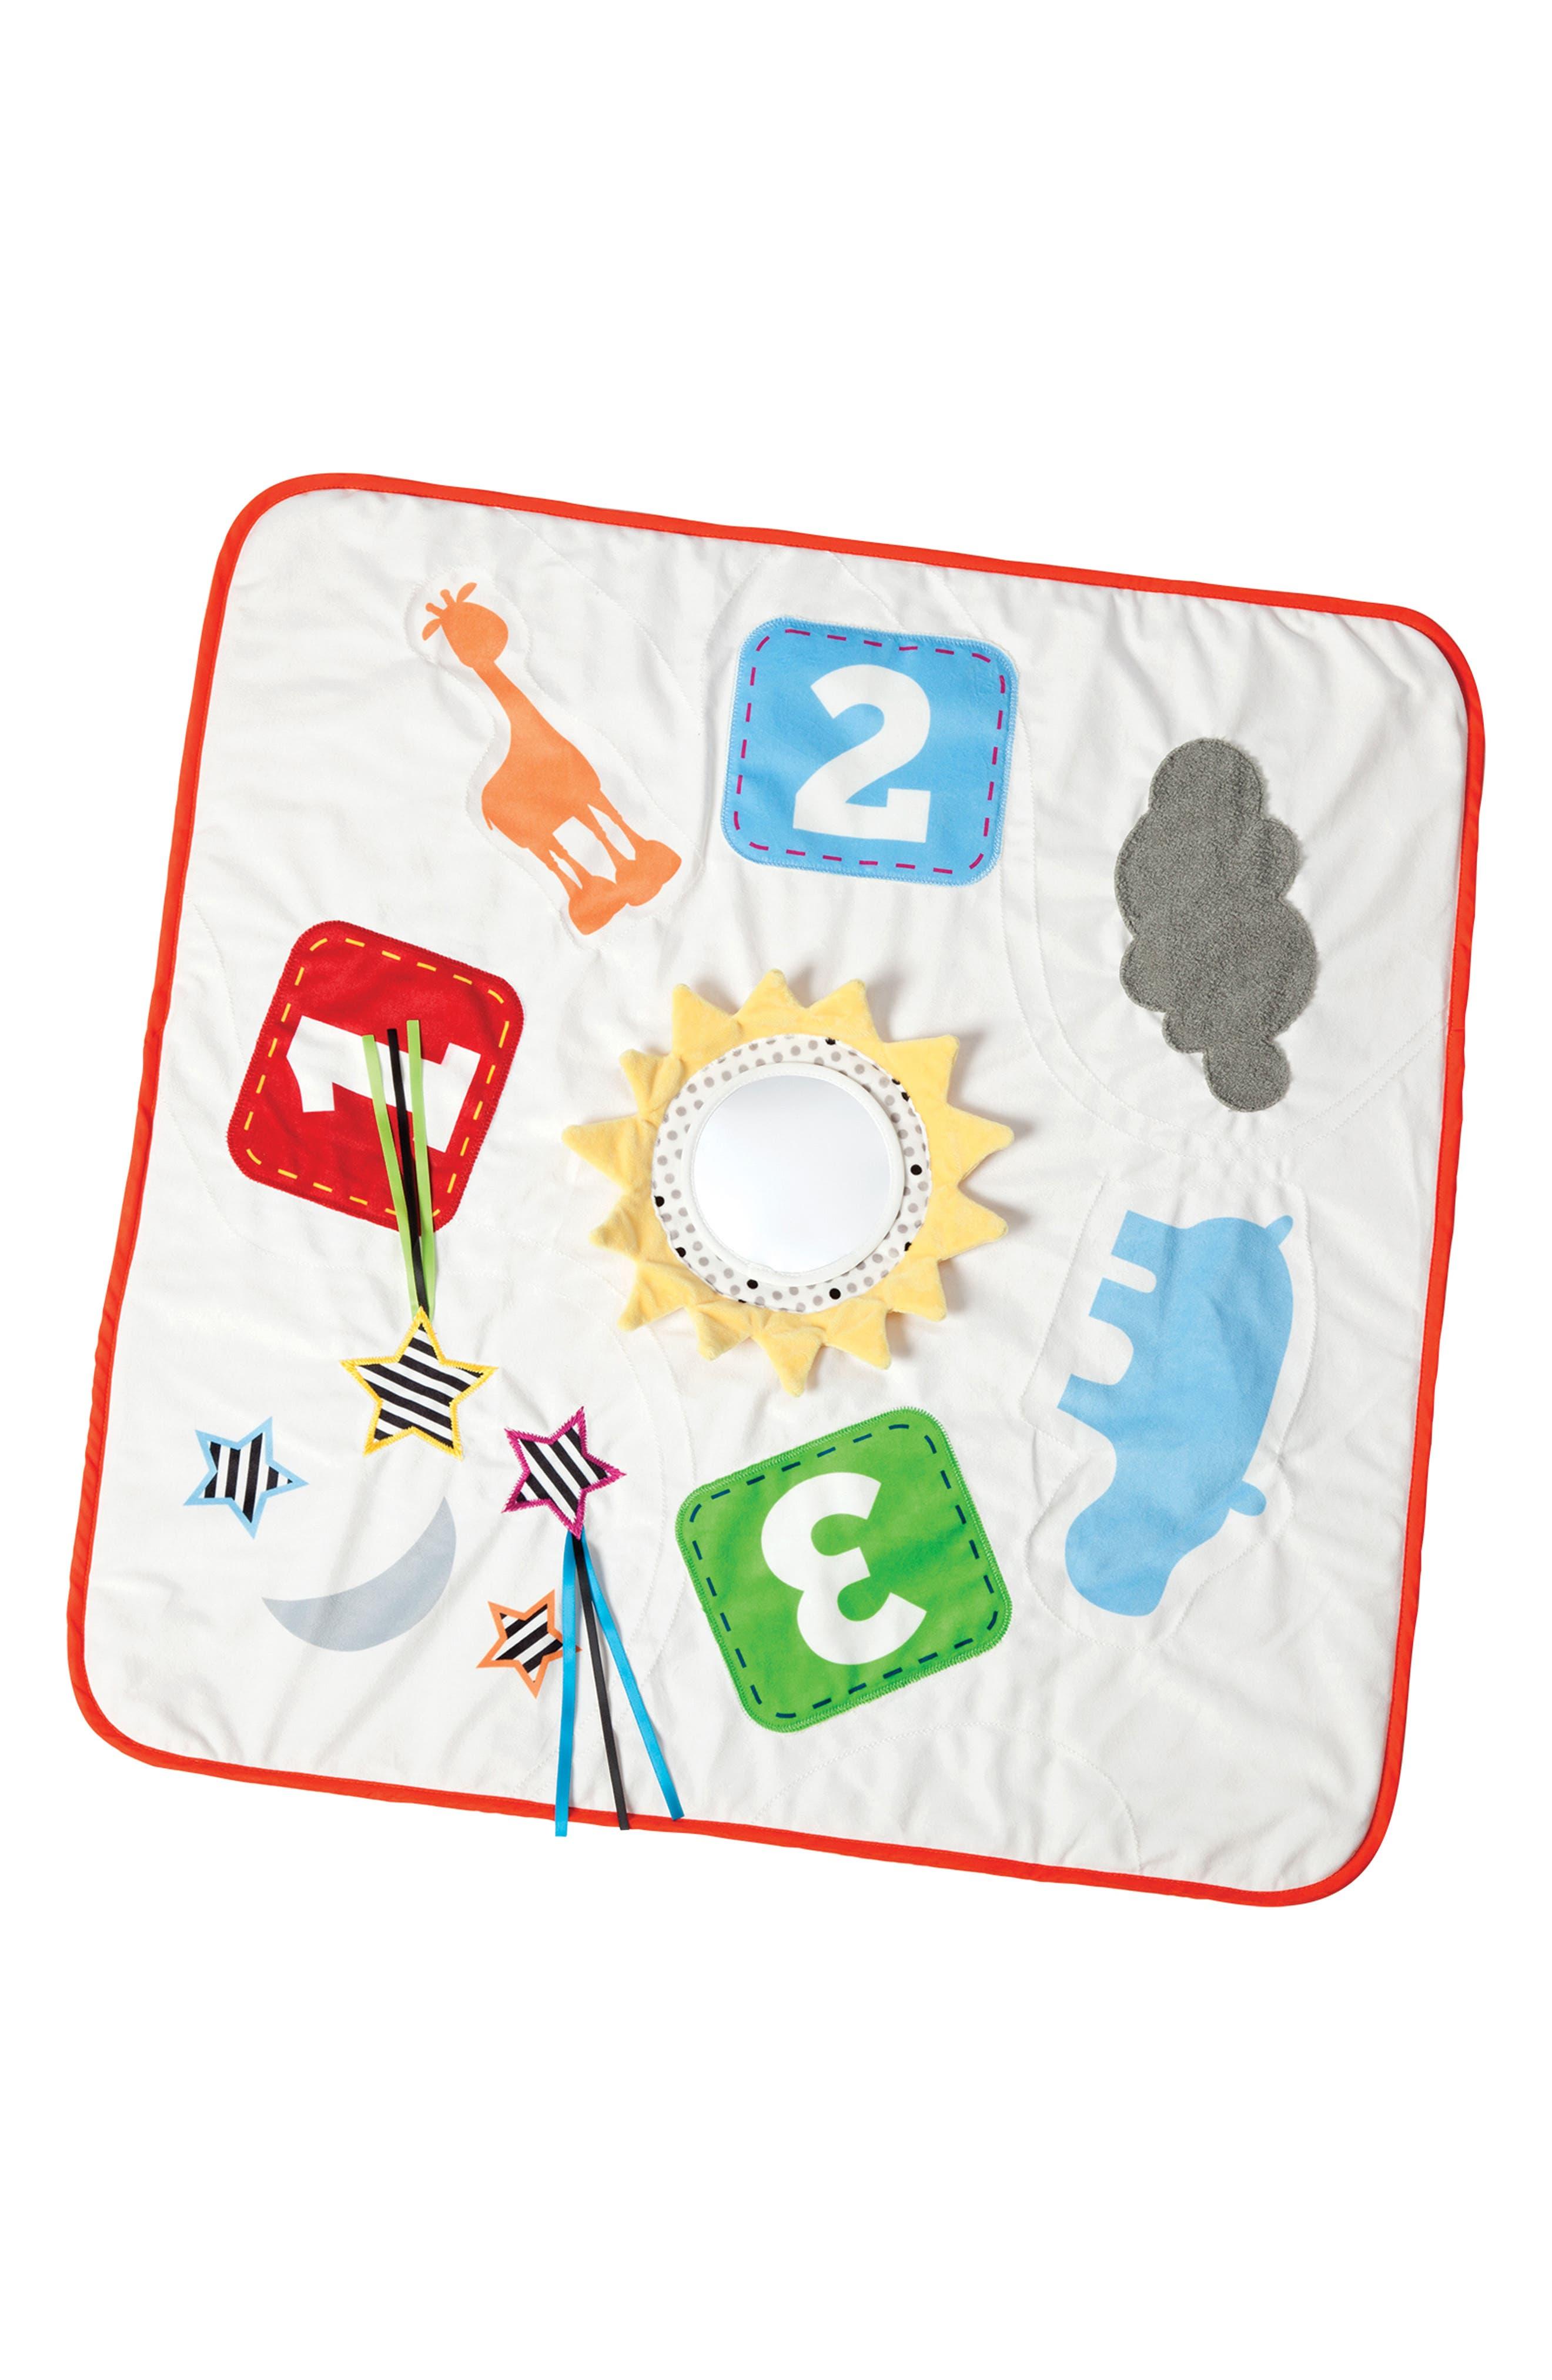 Giggle Playmat,                         Main,                         color, 100